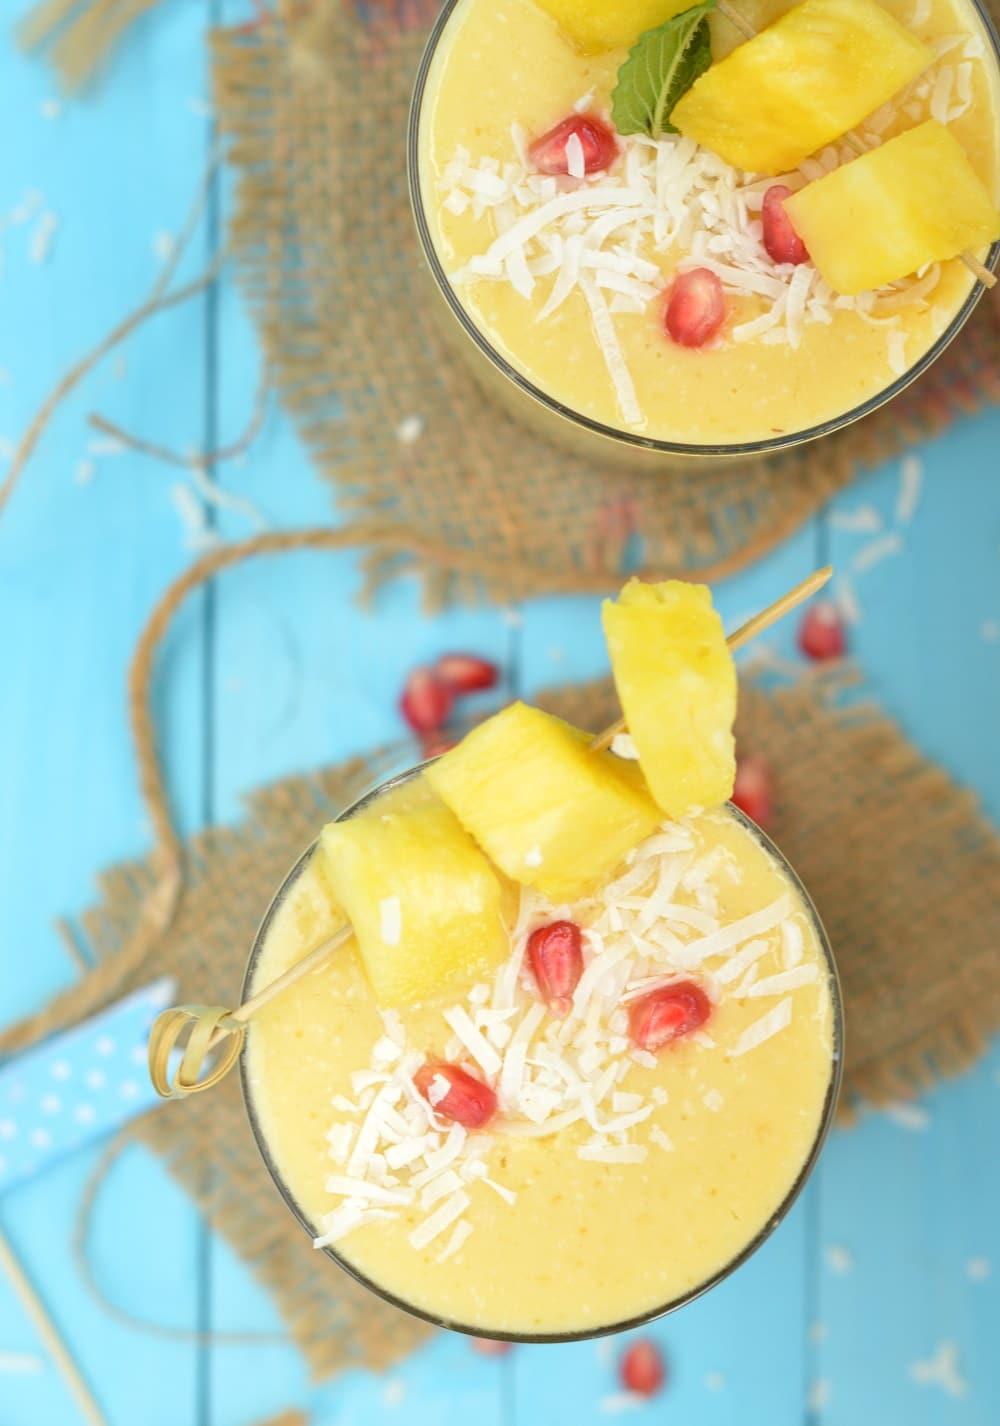 tropical smoothie mango pineapple